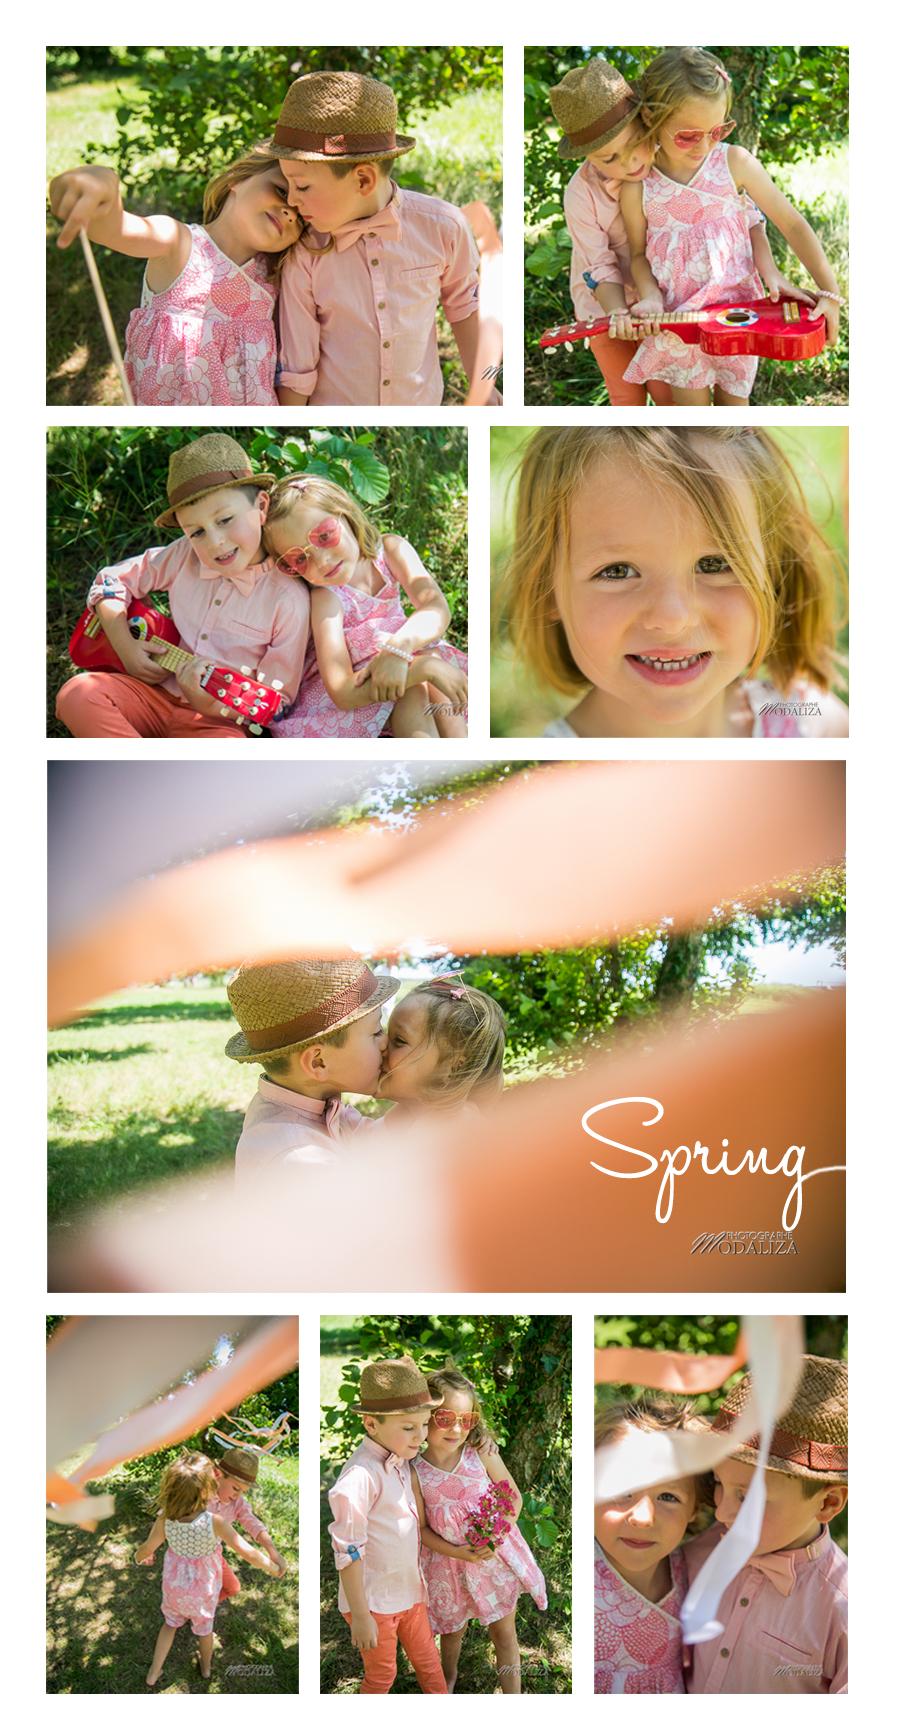 amour 4 saisons photo couple printemps spring kids enfants by modaliza photographe